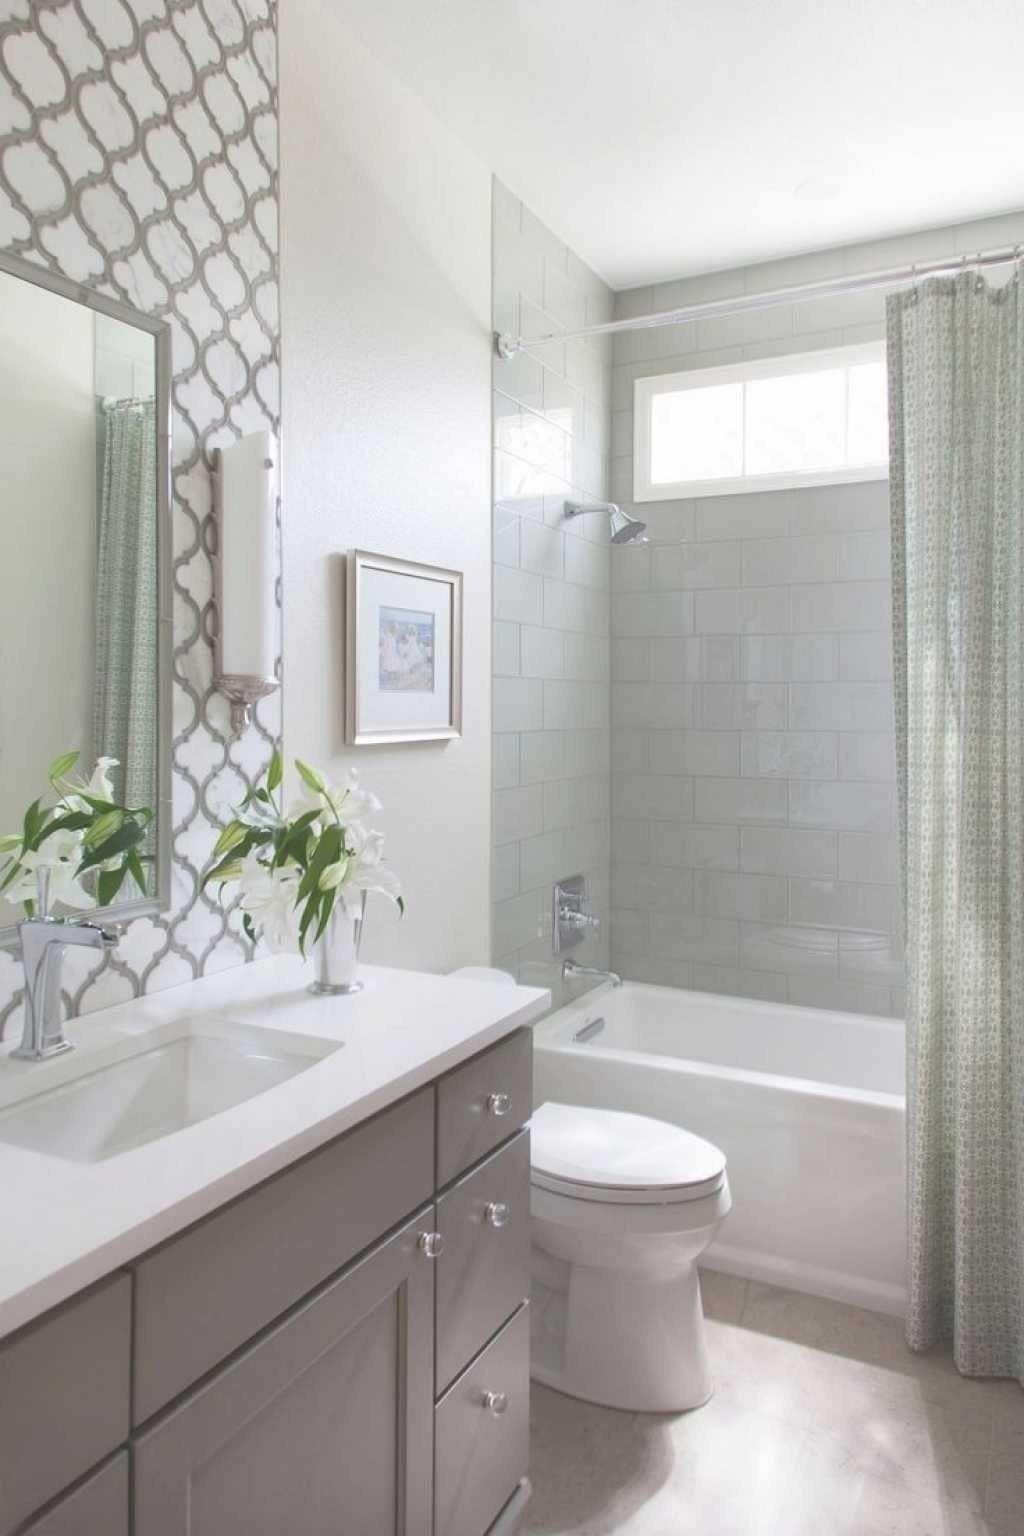 Basement Bathroom Vanity Ideas Smallbasementbathroomideas Basement 1 2 Bathroom Ideas This Bathroom Tub Shower Combo Bathrooms Remodel Small Bathroom Remodel